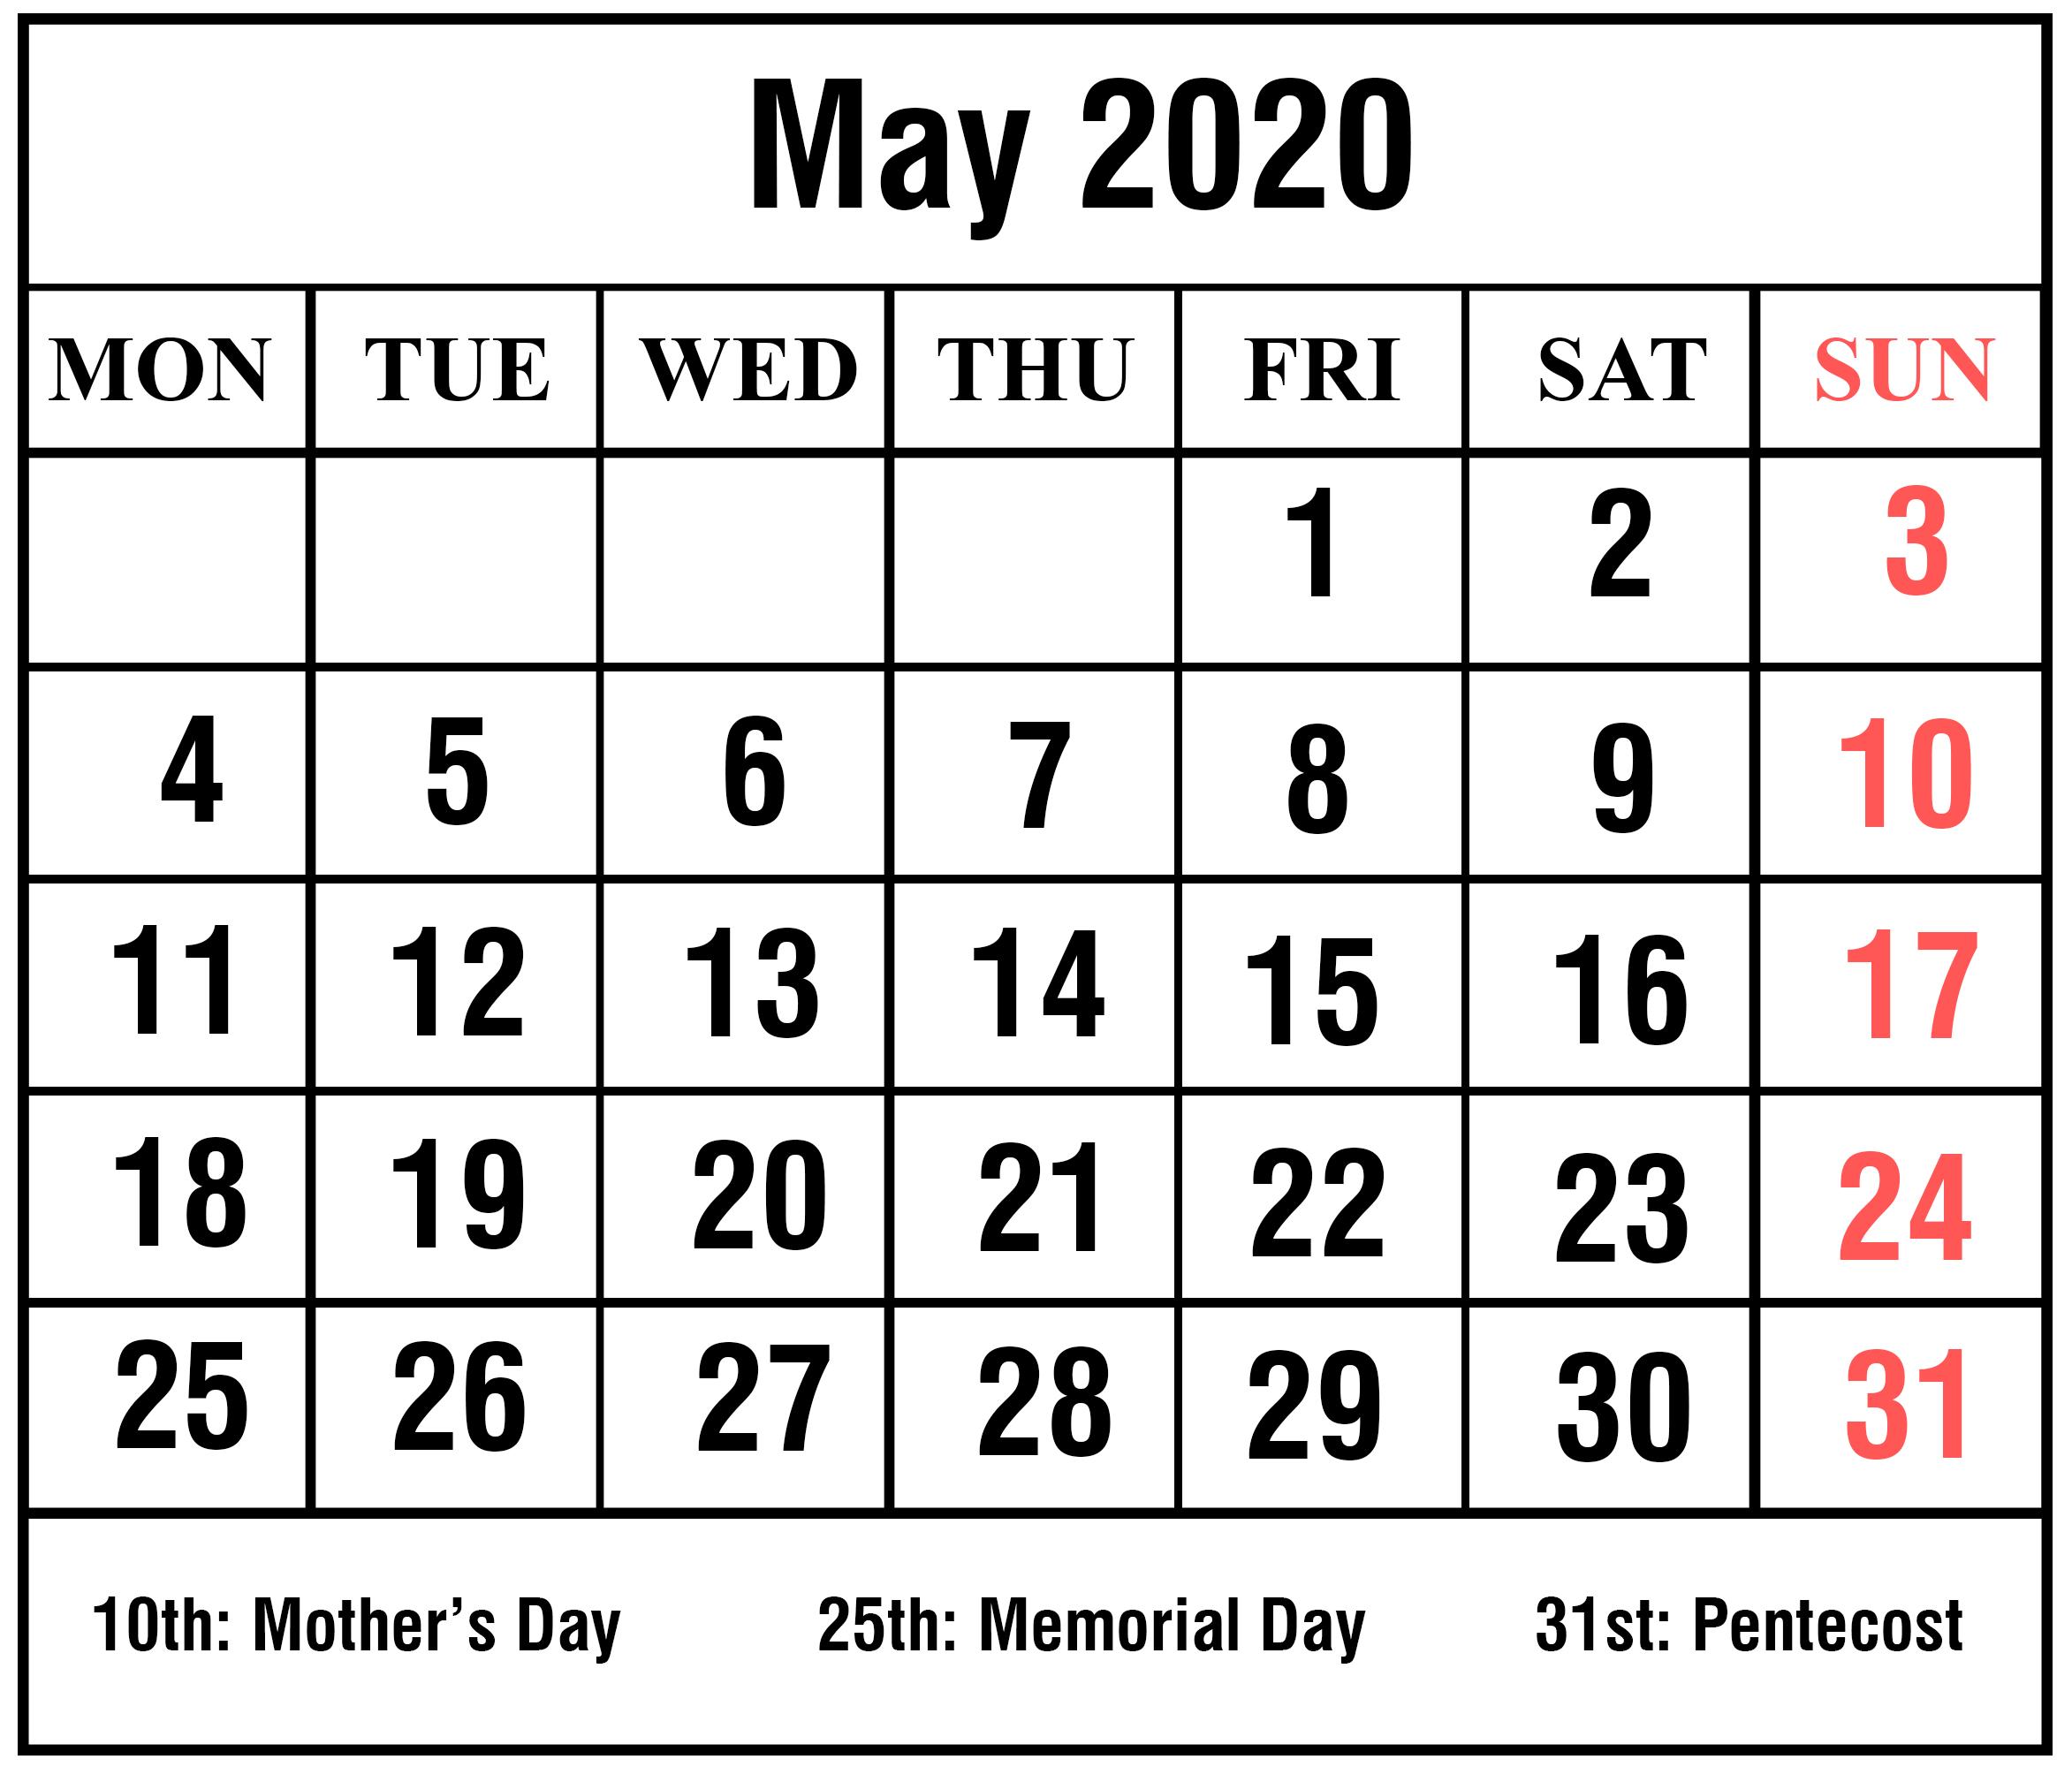 Editable May 2020 Calendar with Holidays